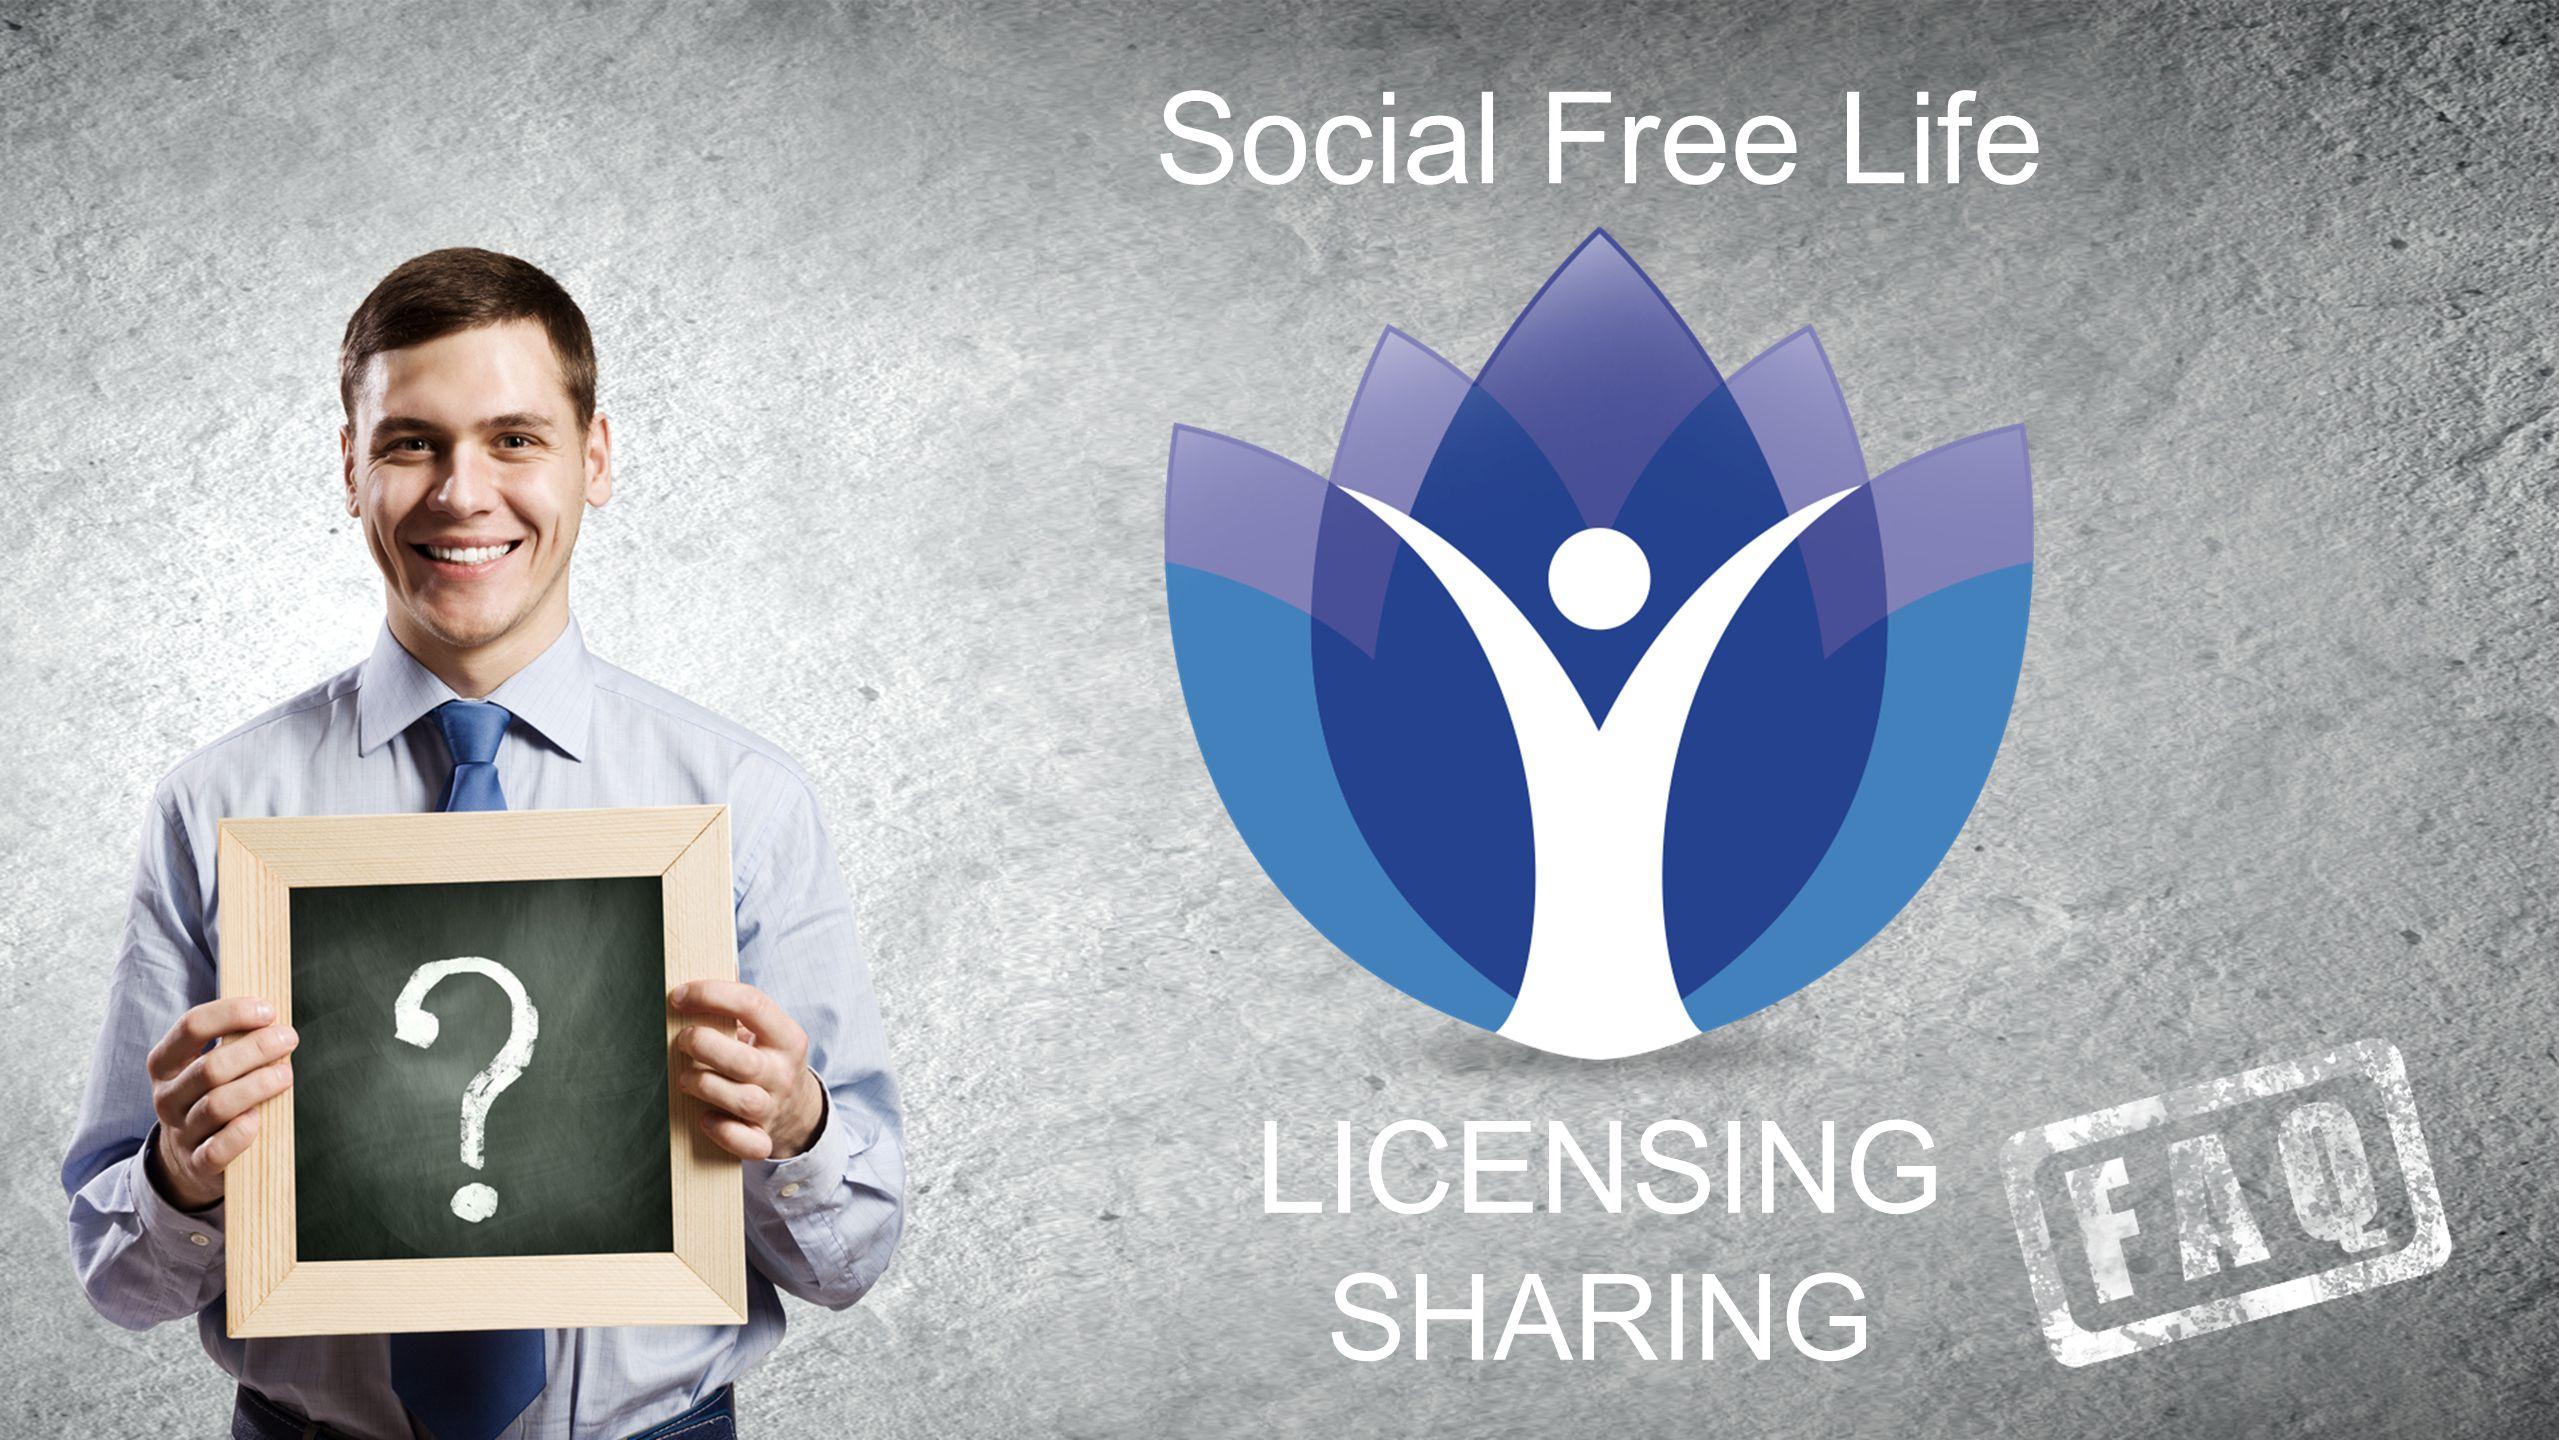 Social Free Life SHARING LICENSING